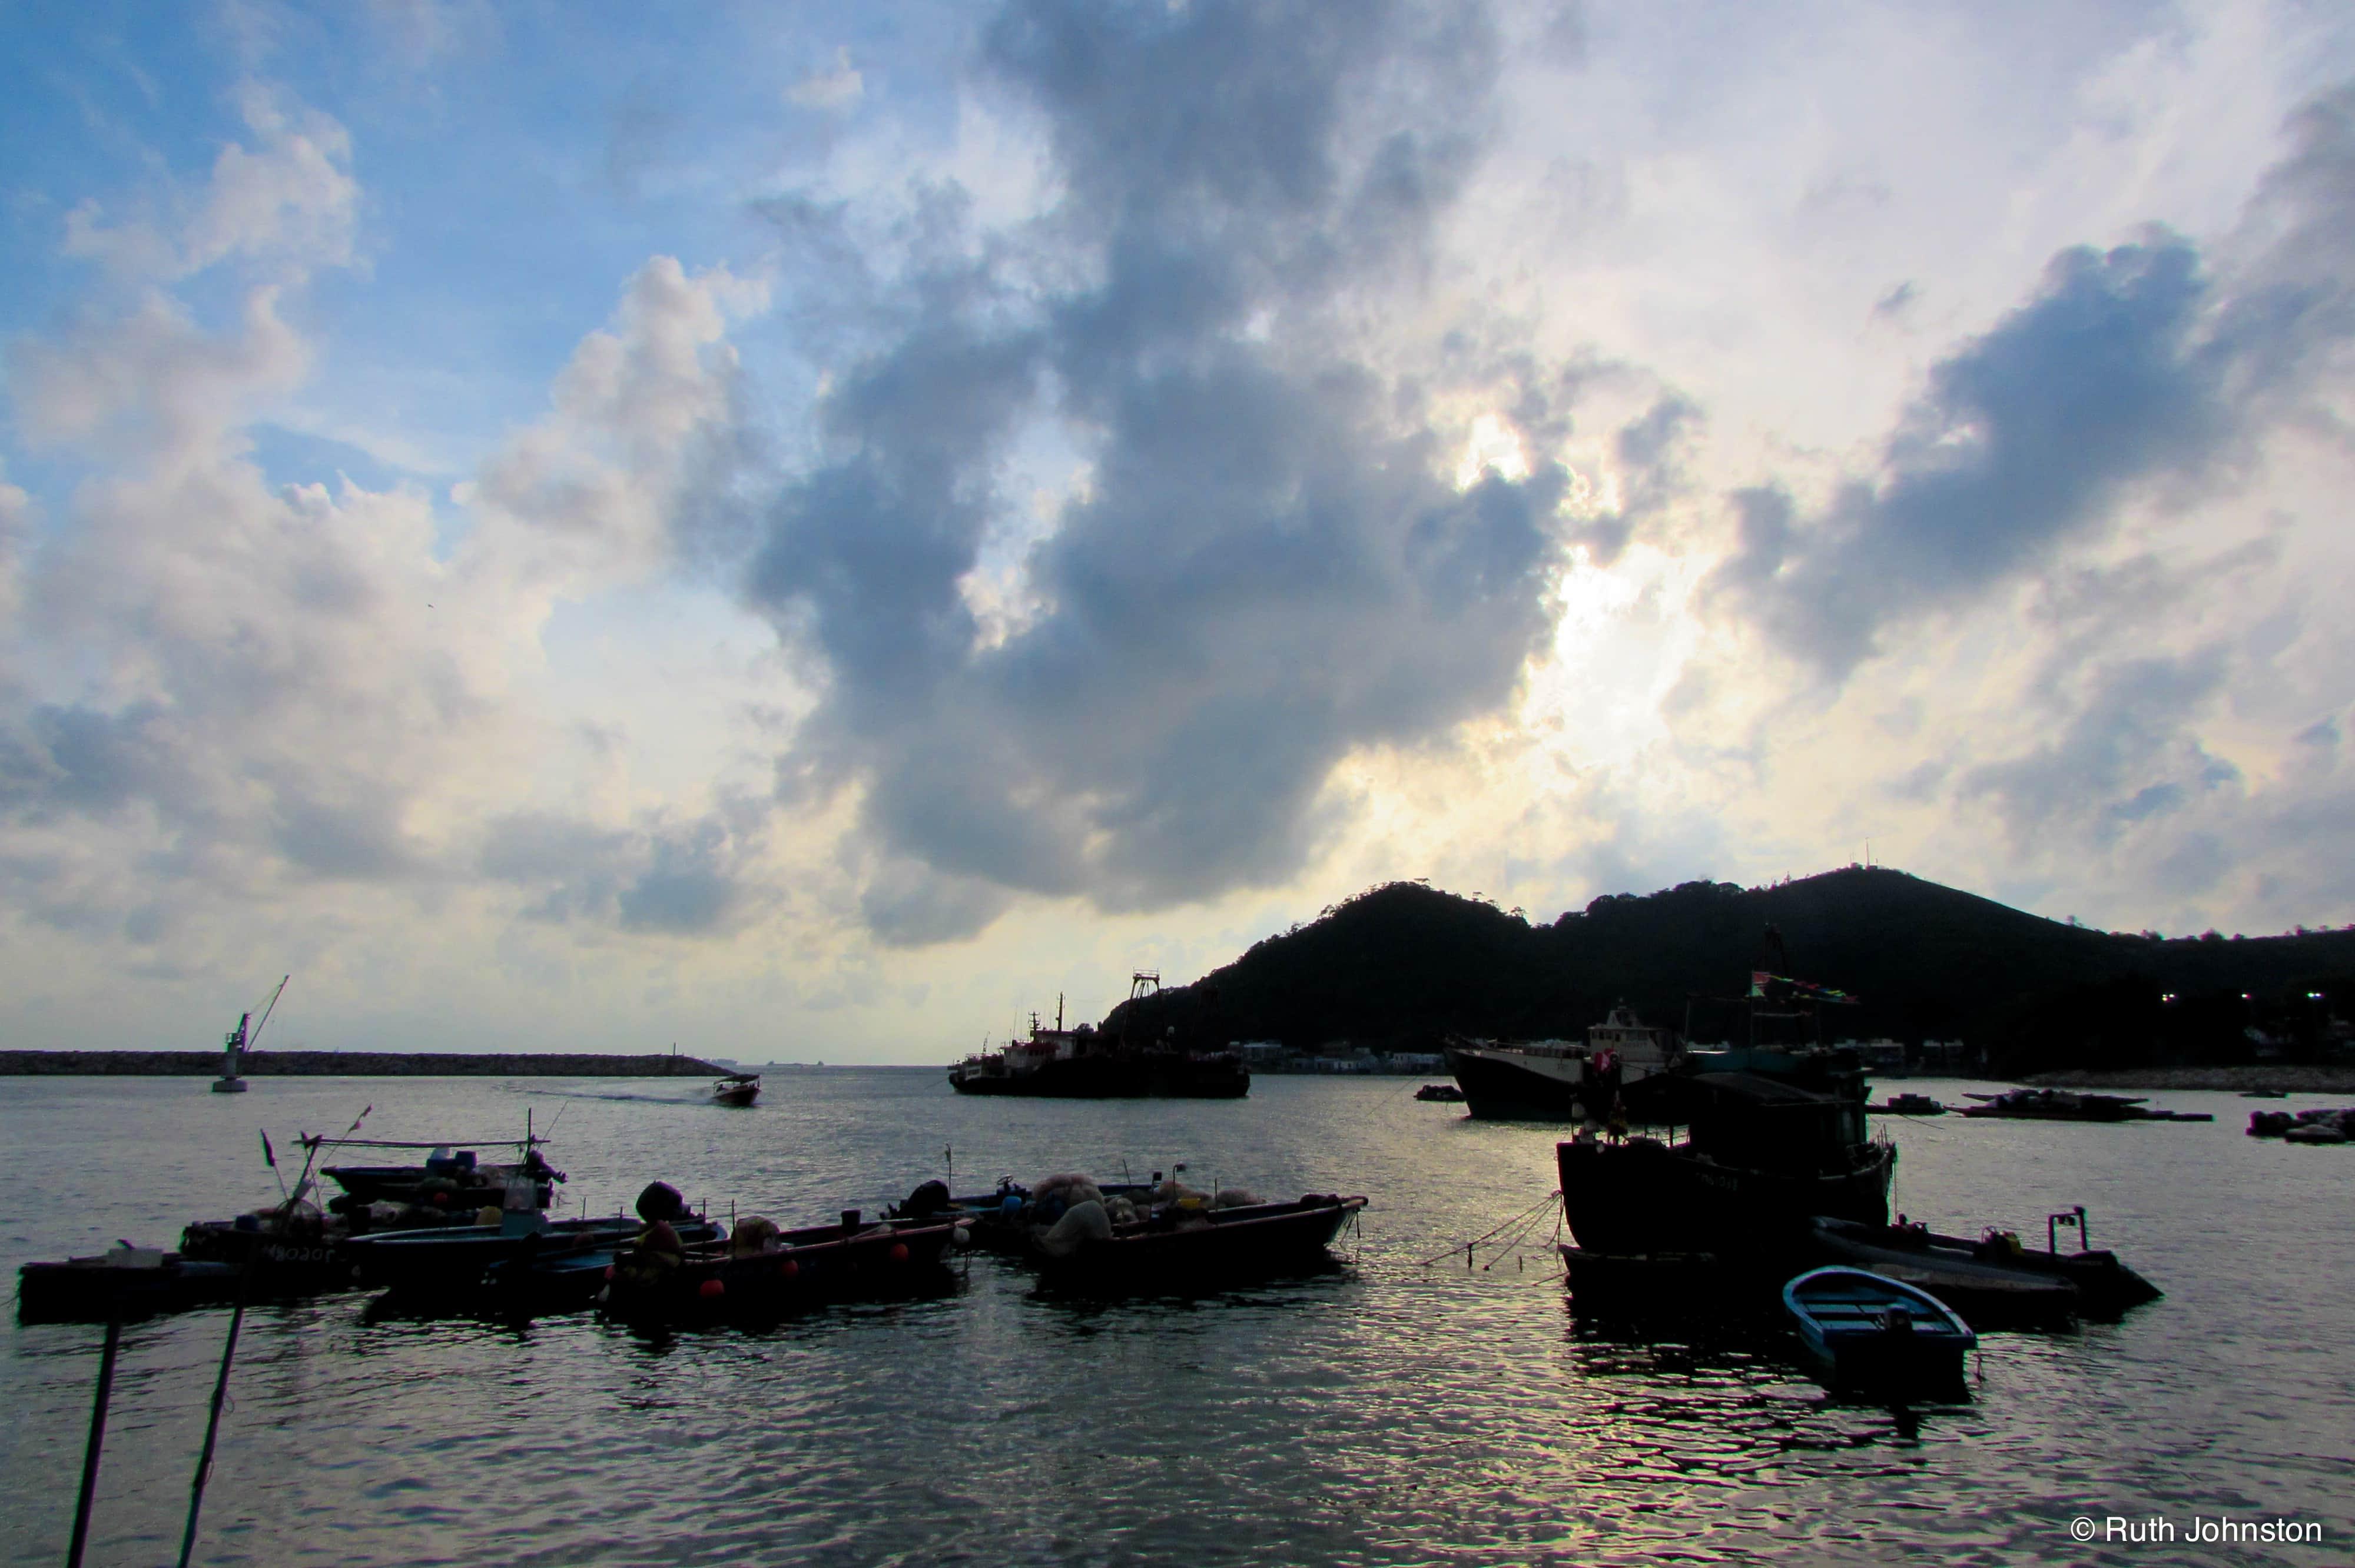 Hong Kong tourist spots, Tai O Fishing Village